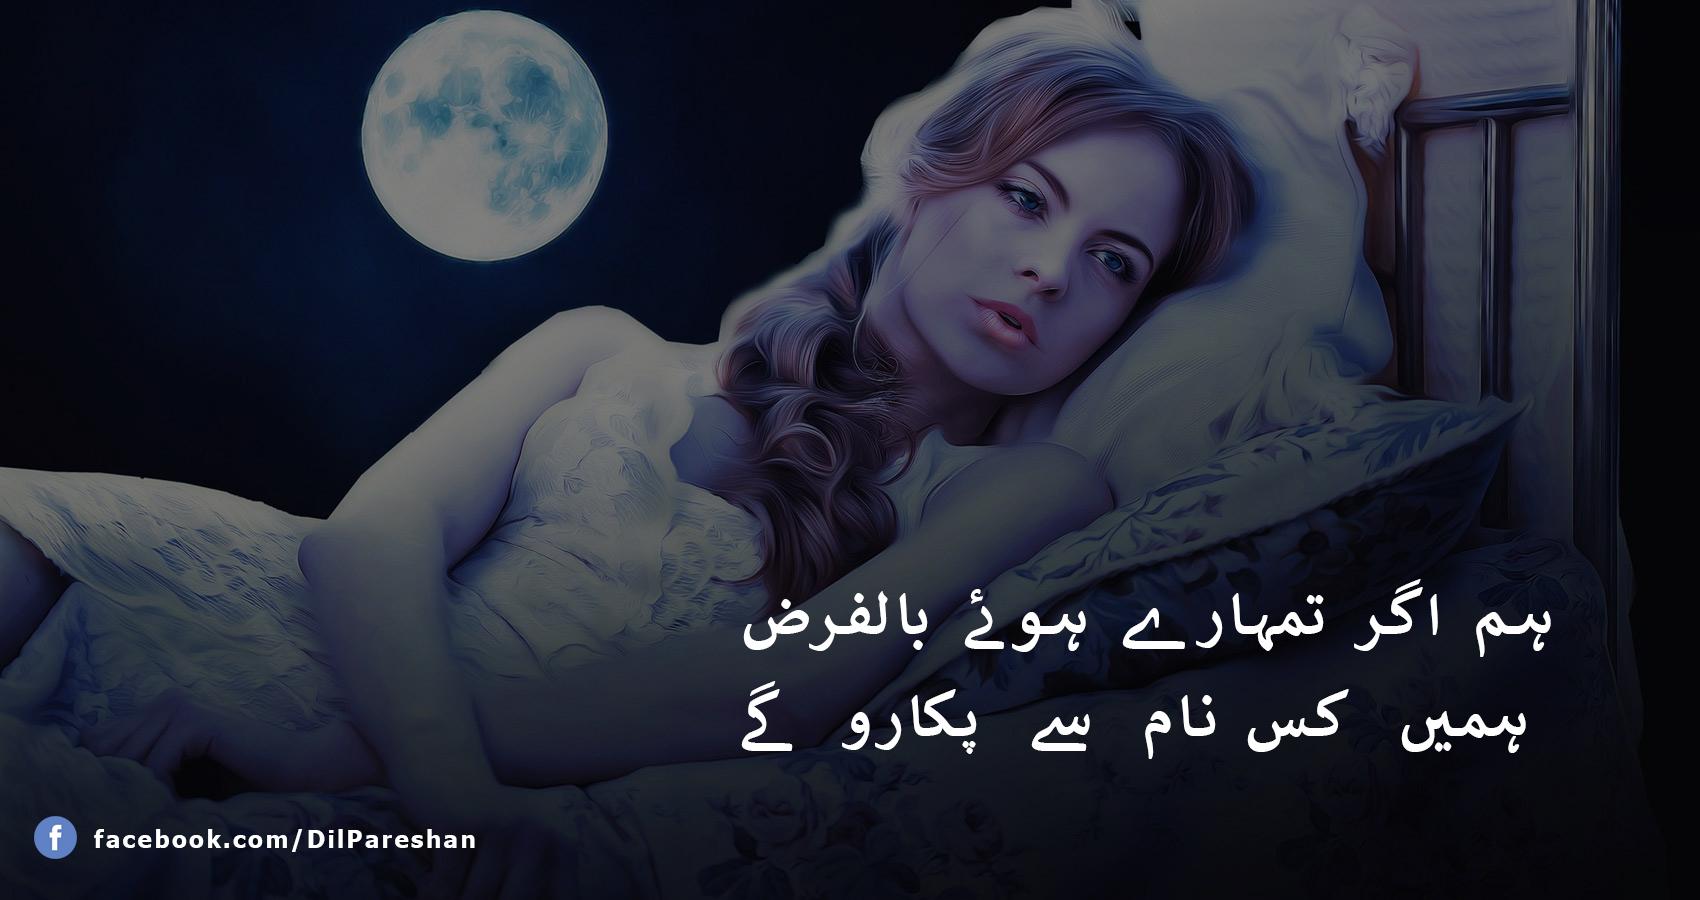 hamiy kis nam say pokaro gy two line urdu poetry